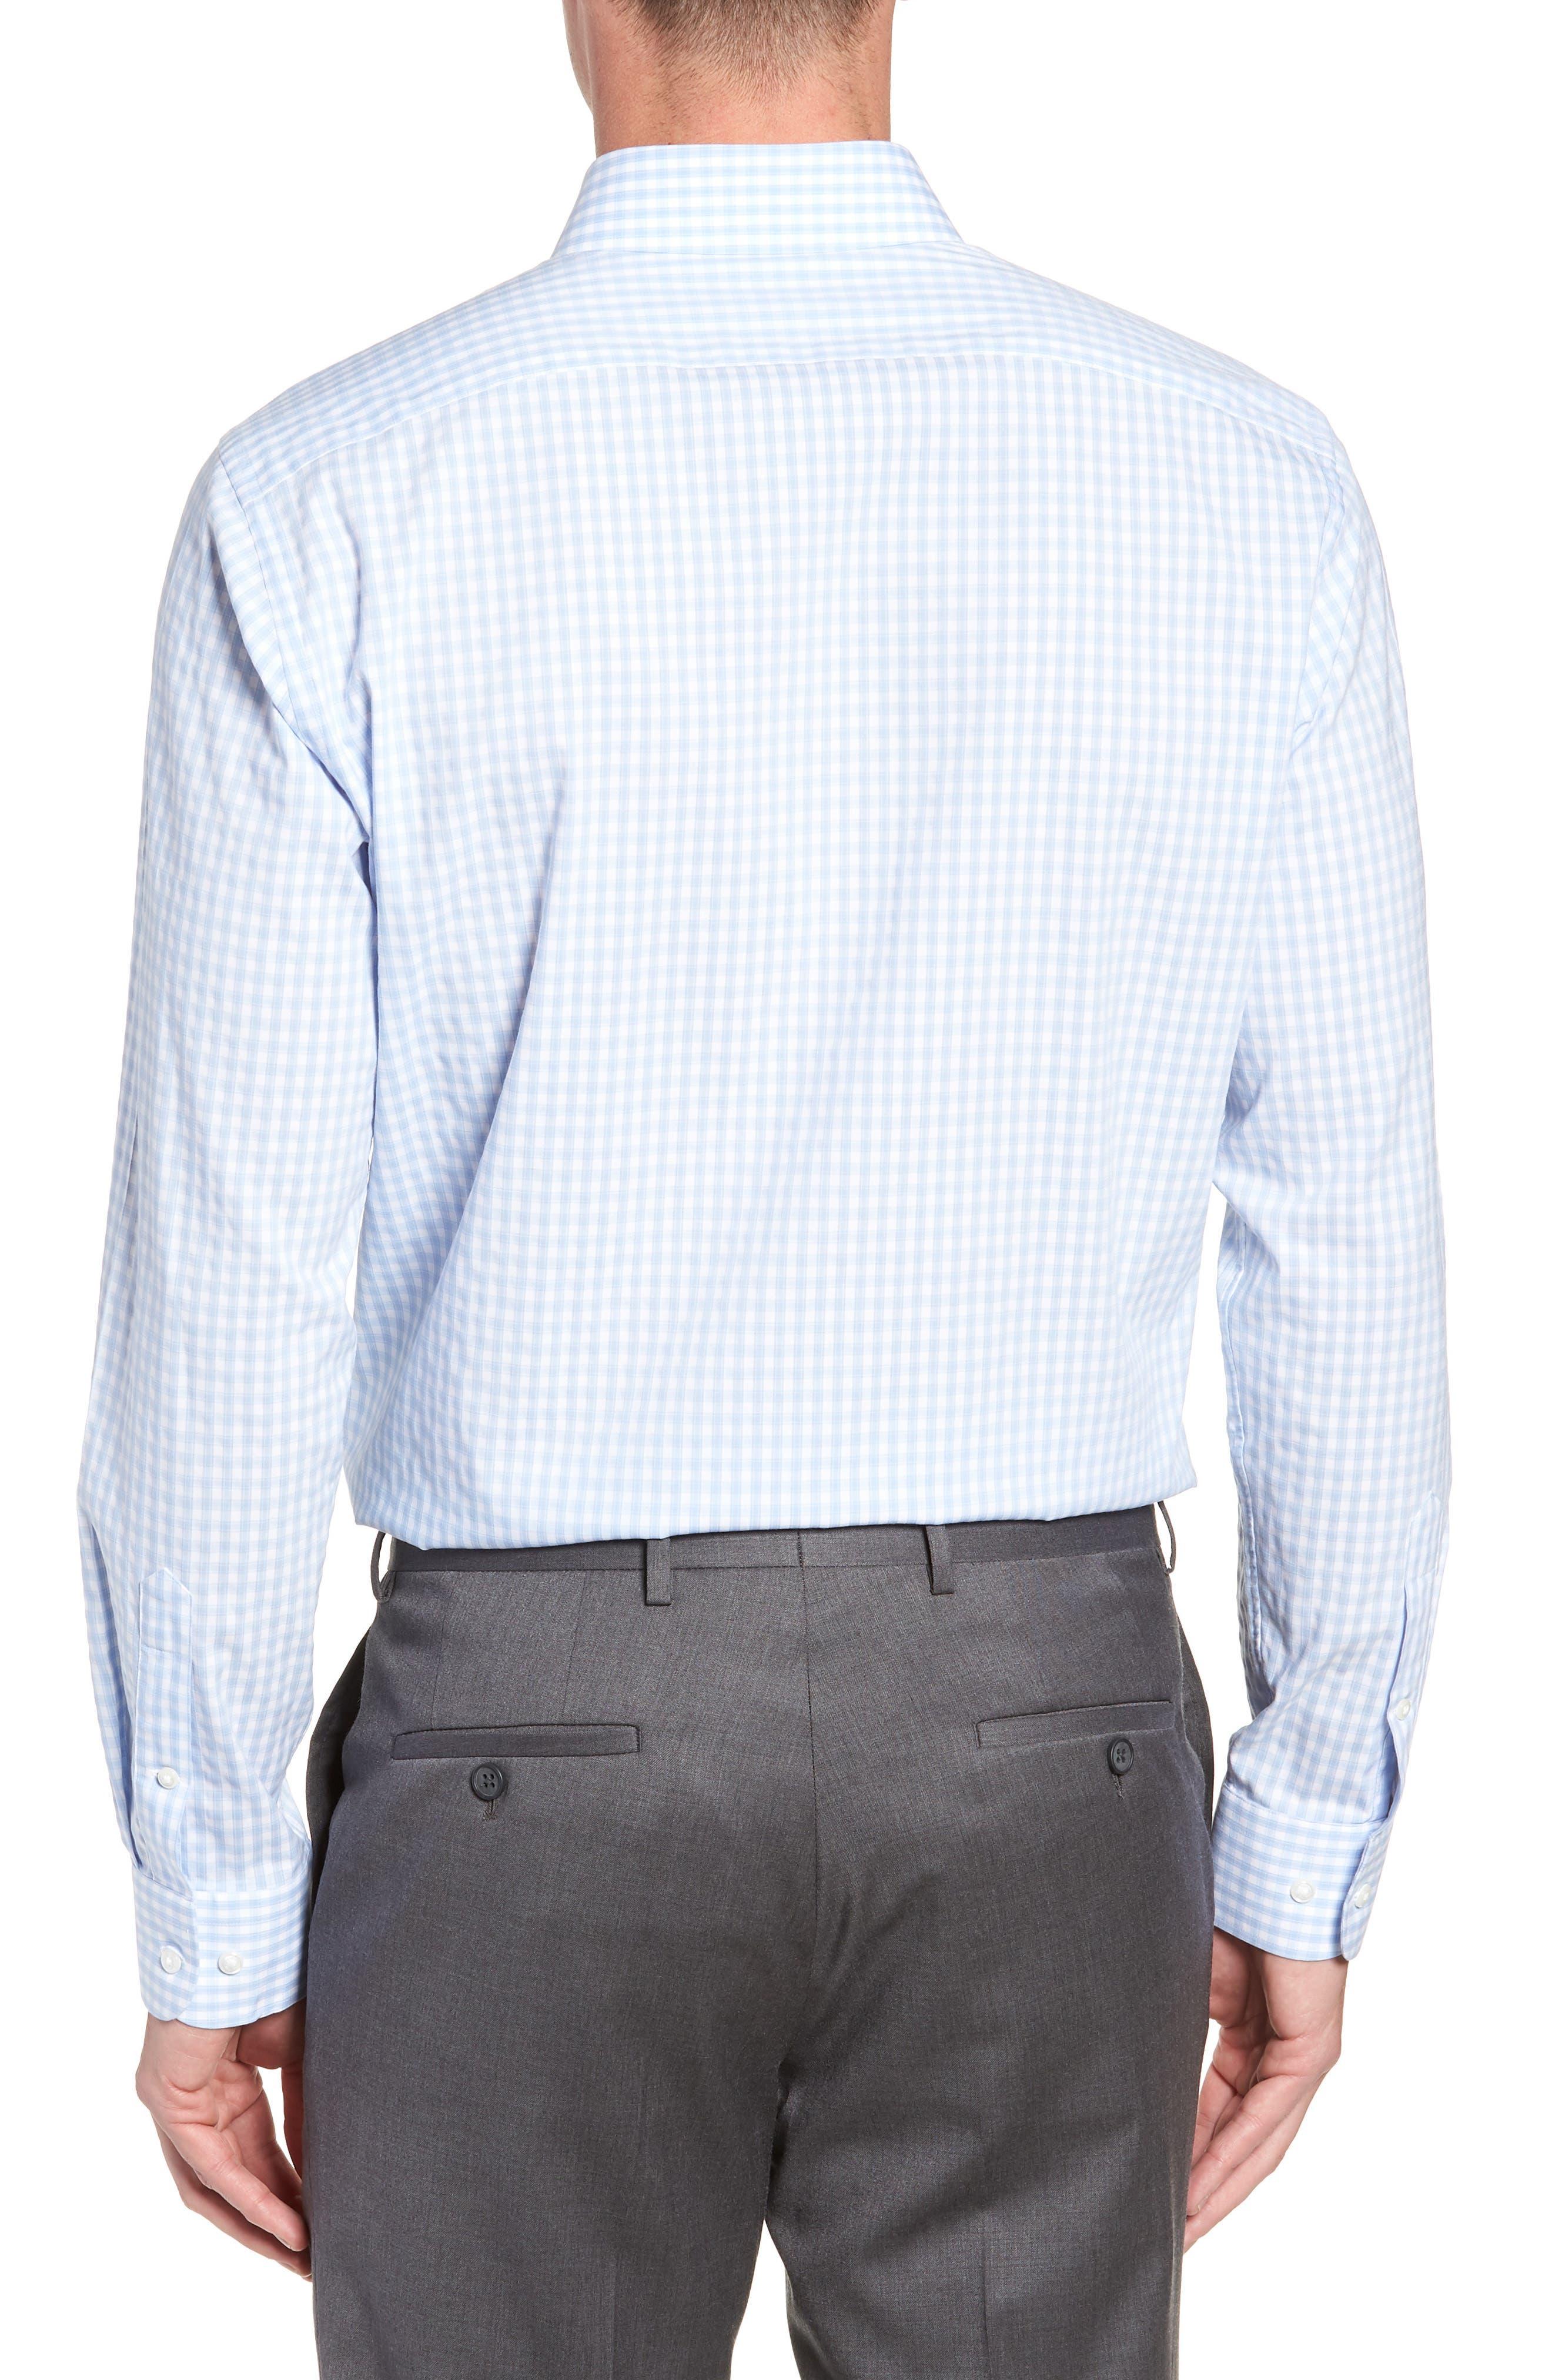 Tech-Smart Trim Fit Stretch Check Dress Shirt,                             Alternate thumbnail 3, color,                             BLUE BRUNNERA